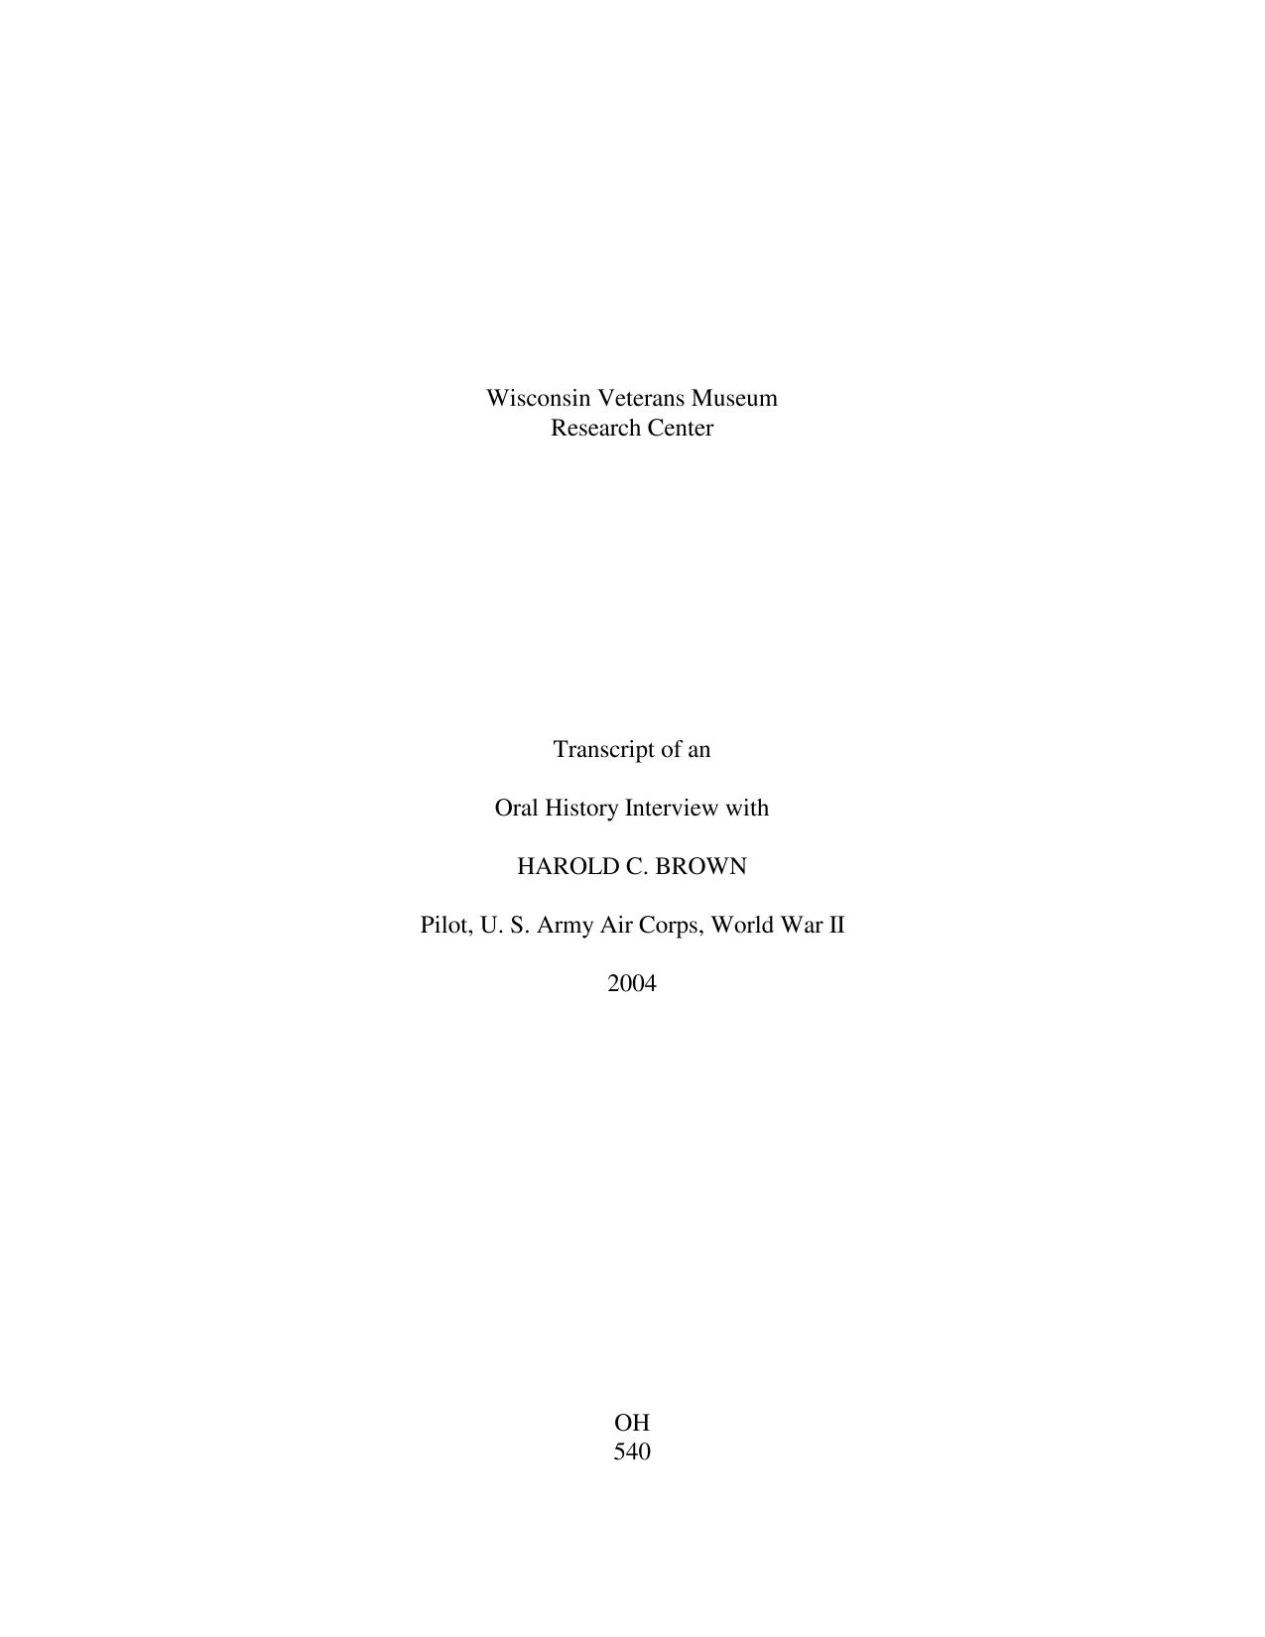 Oral History Transcript